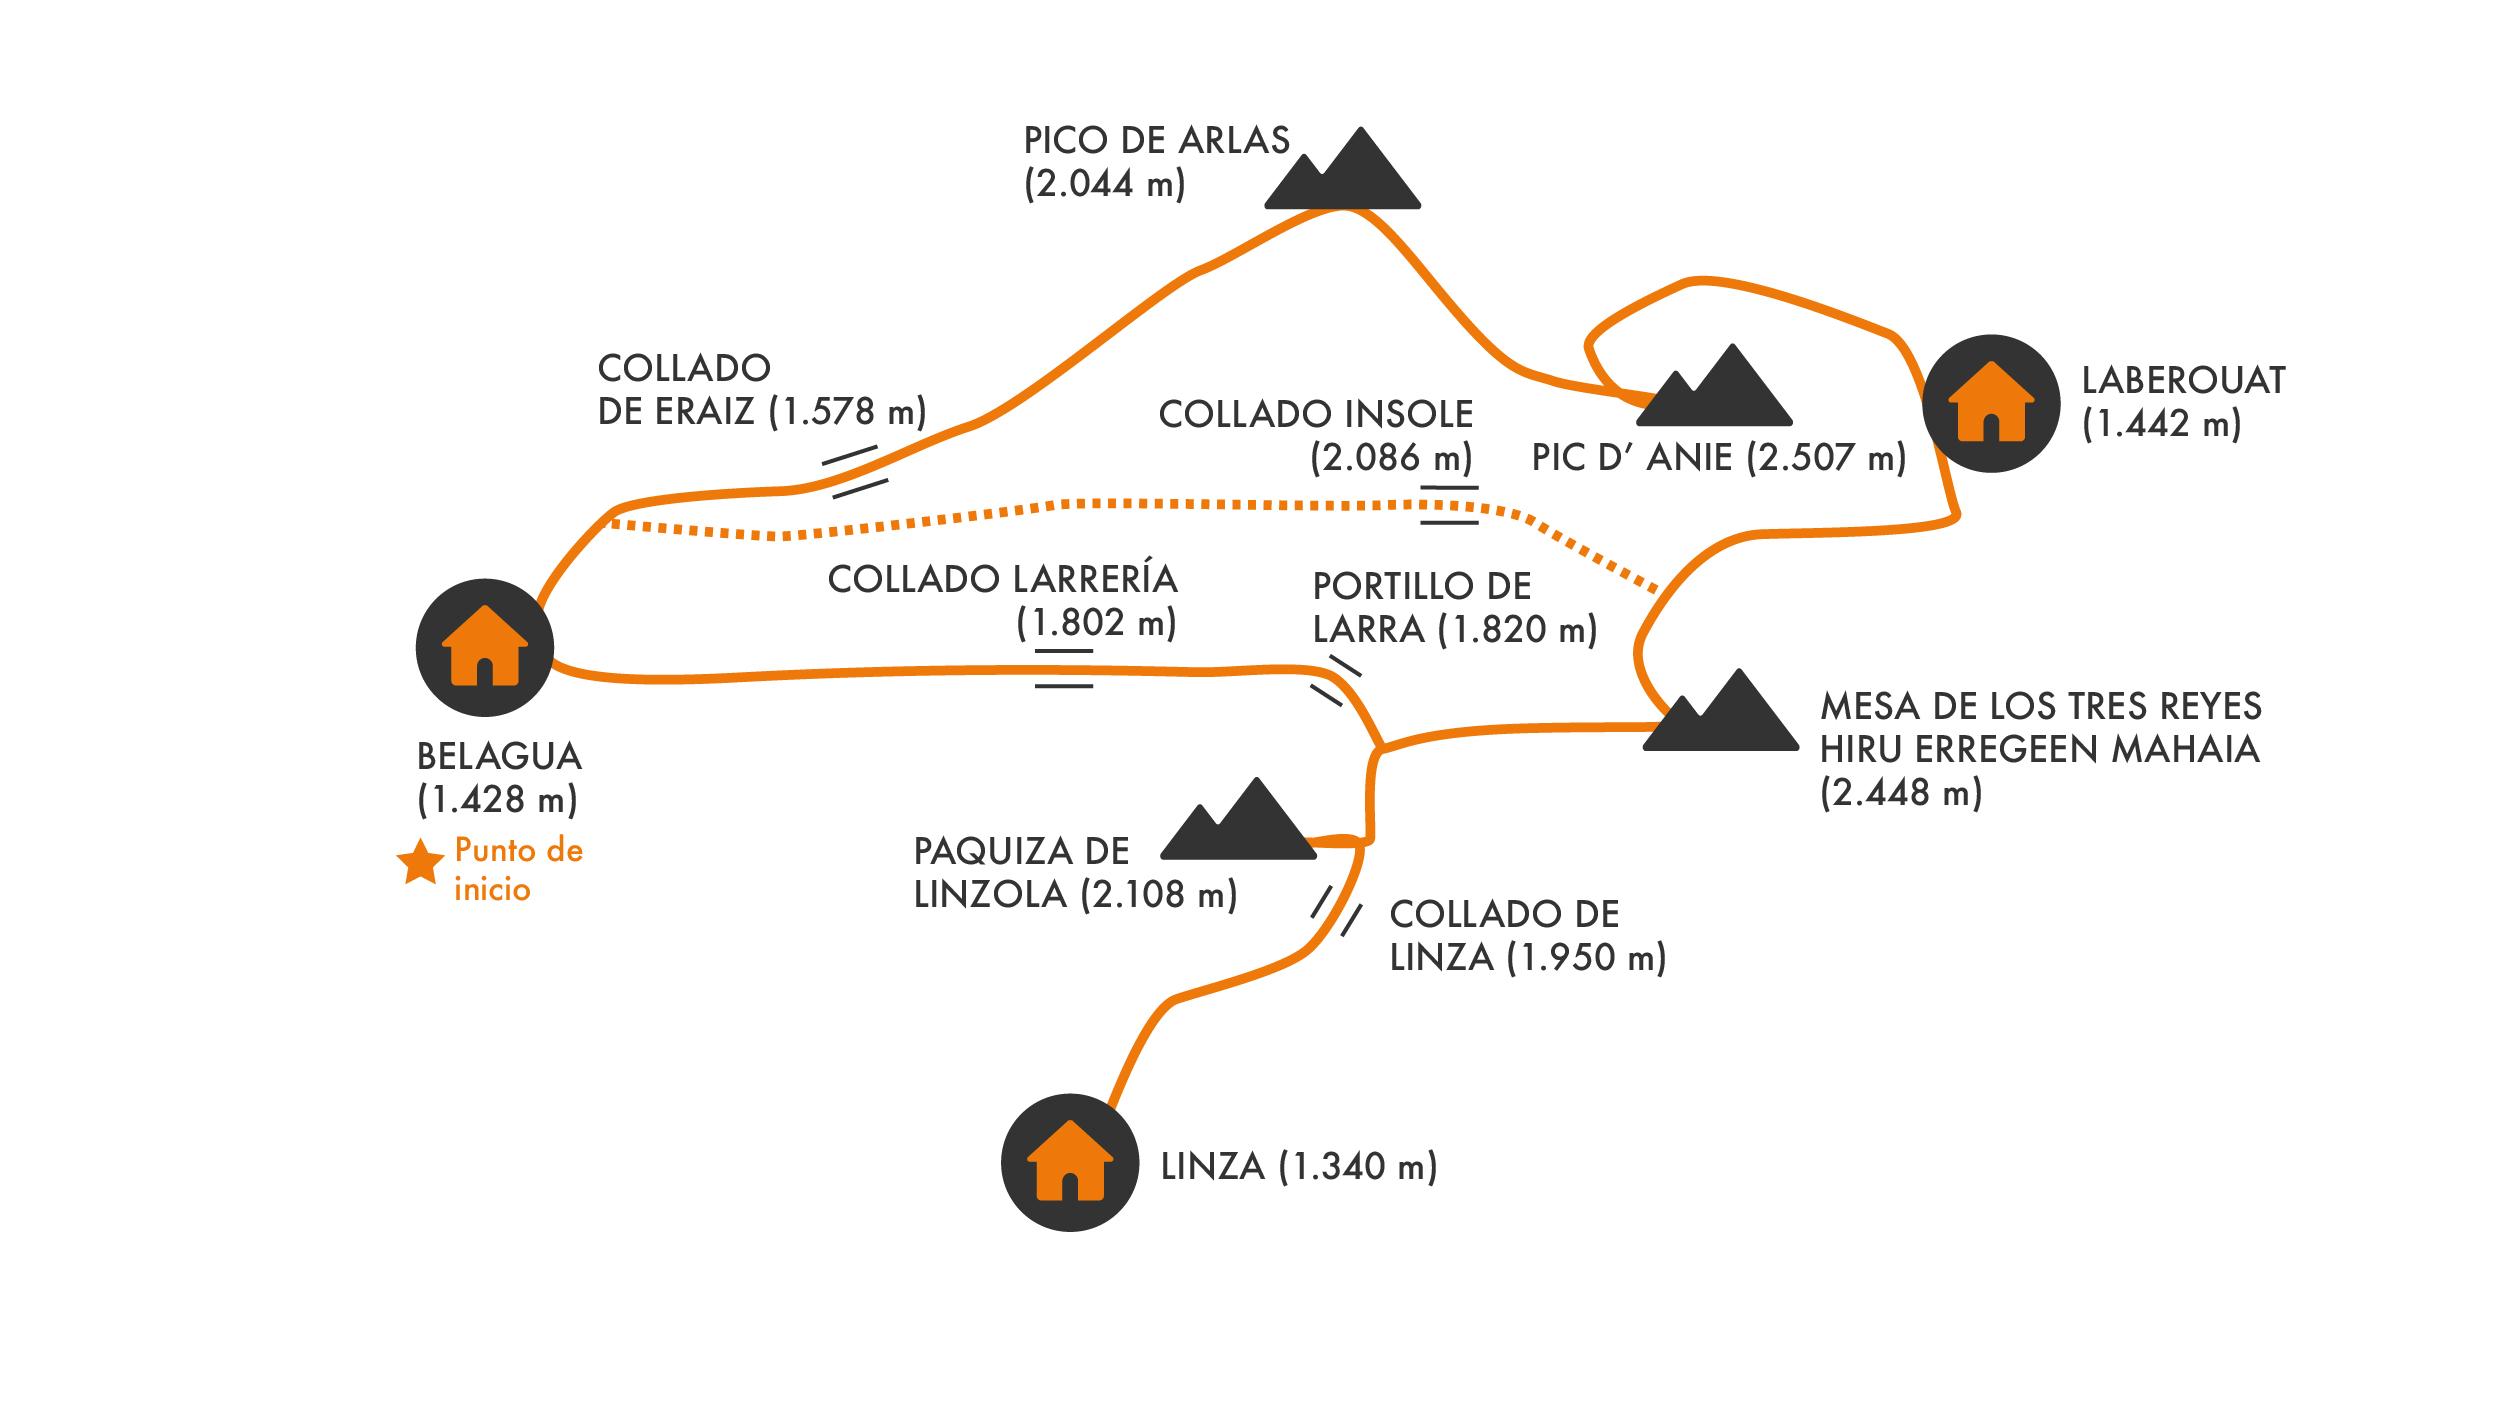 Ruta de las Golondrinas. Mapa golondrina Alpina